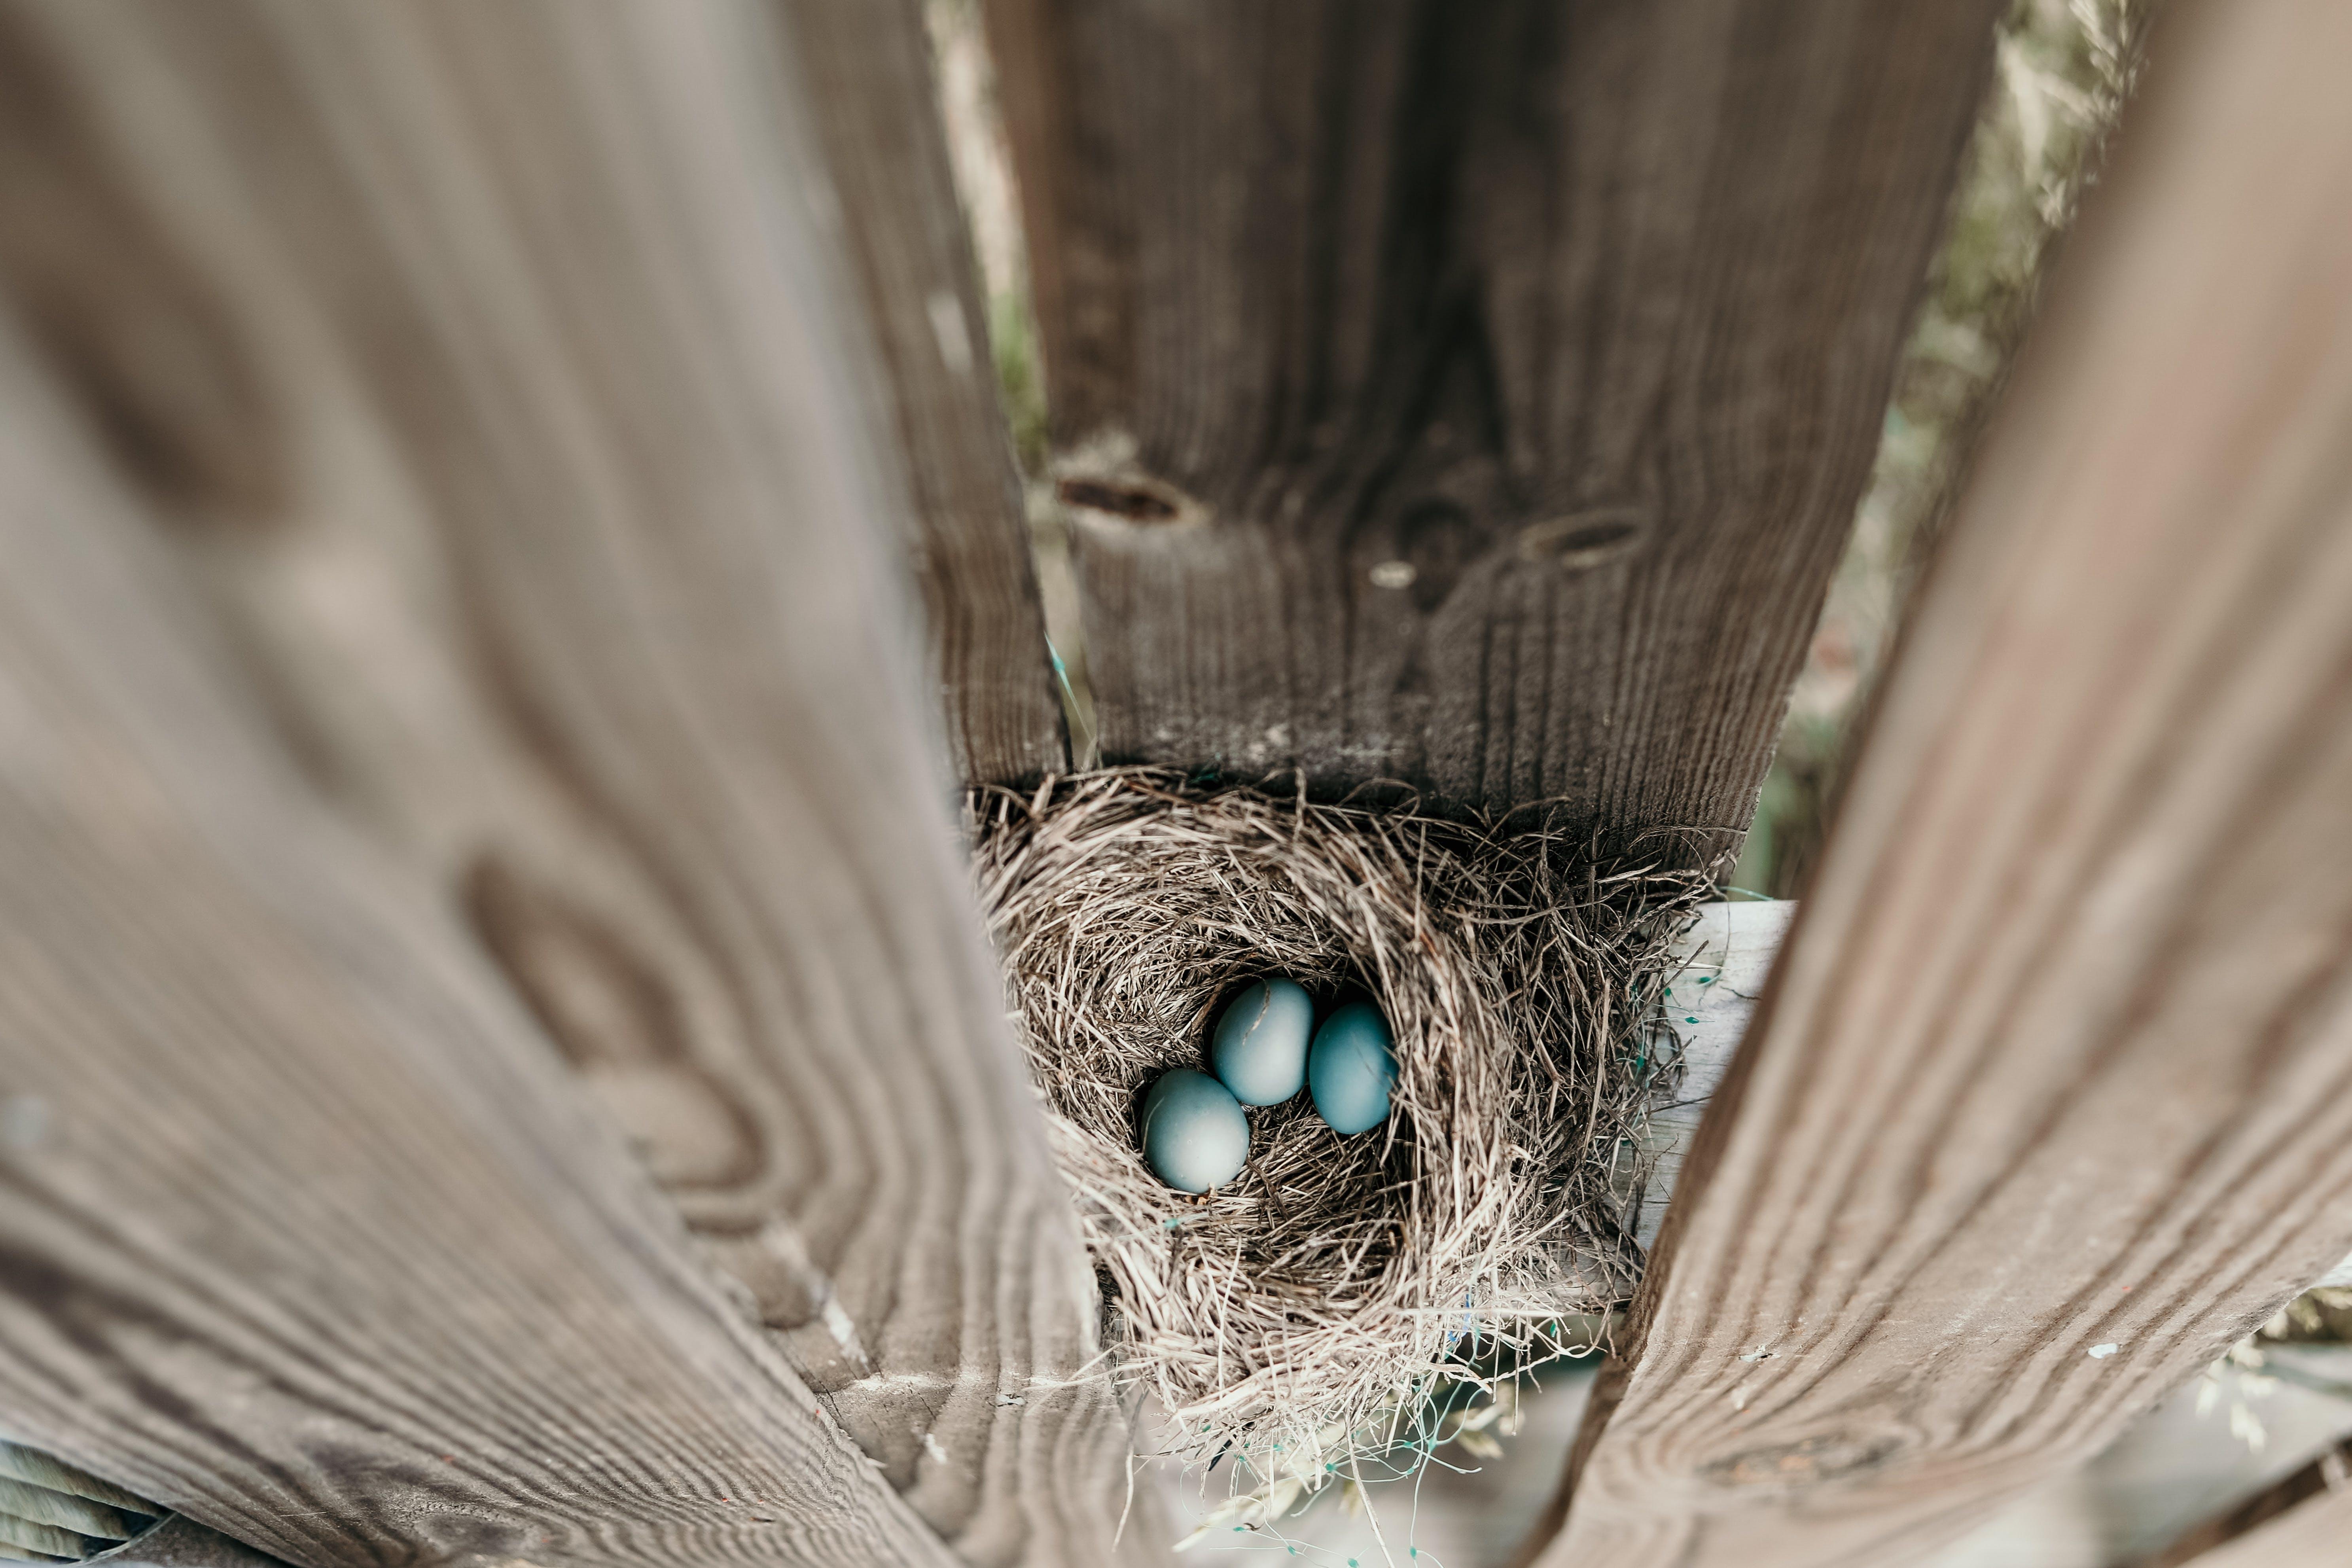 Základová fotografie zdarma na téma hnízdo, ptačí hnízdo, vejce